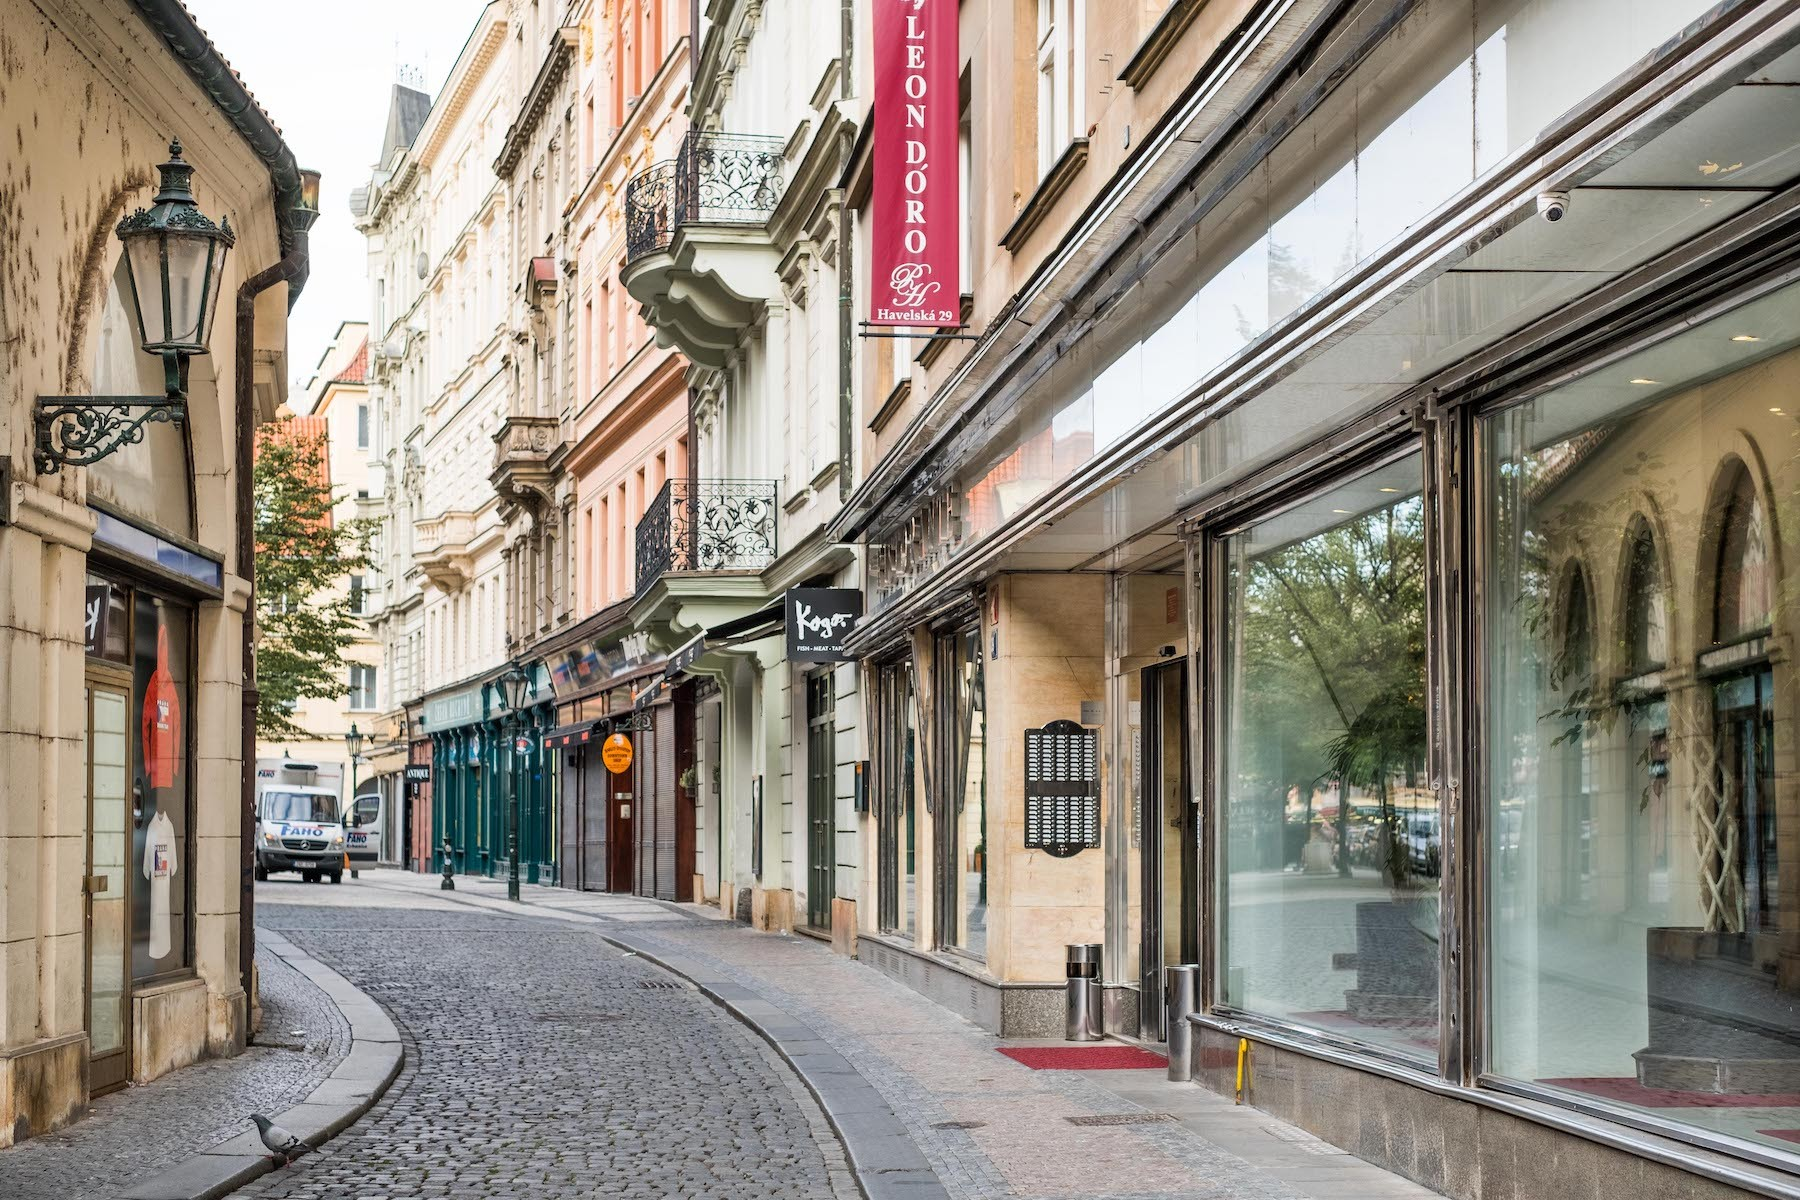 f0ad911c9c Hotel Leon D Oro - stylový hotel v centru Prahy